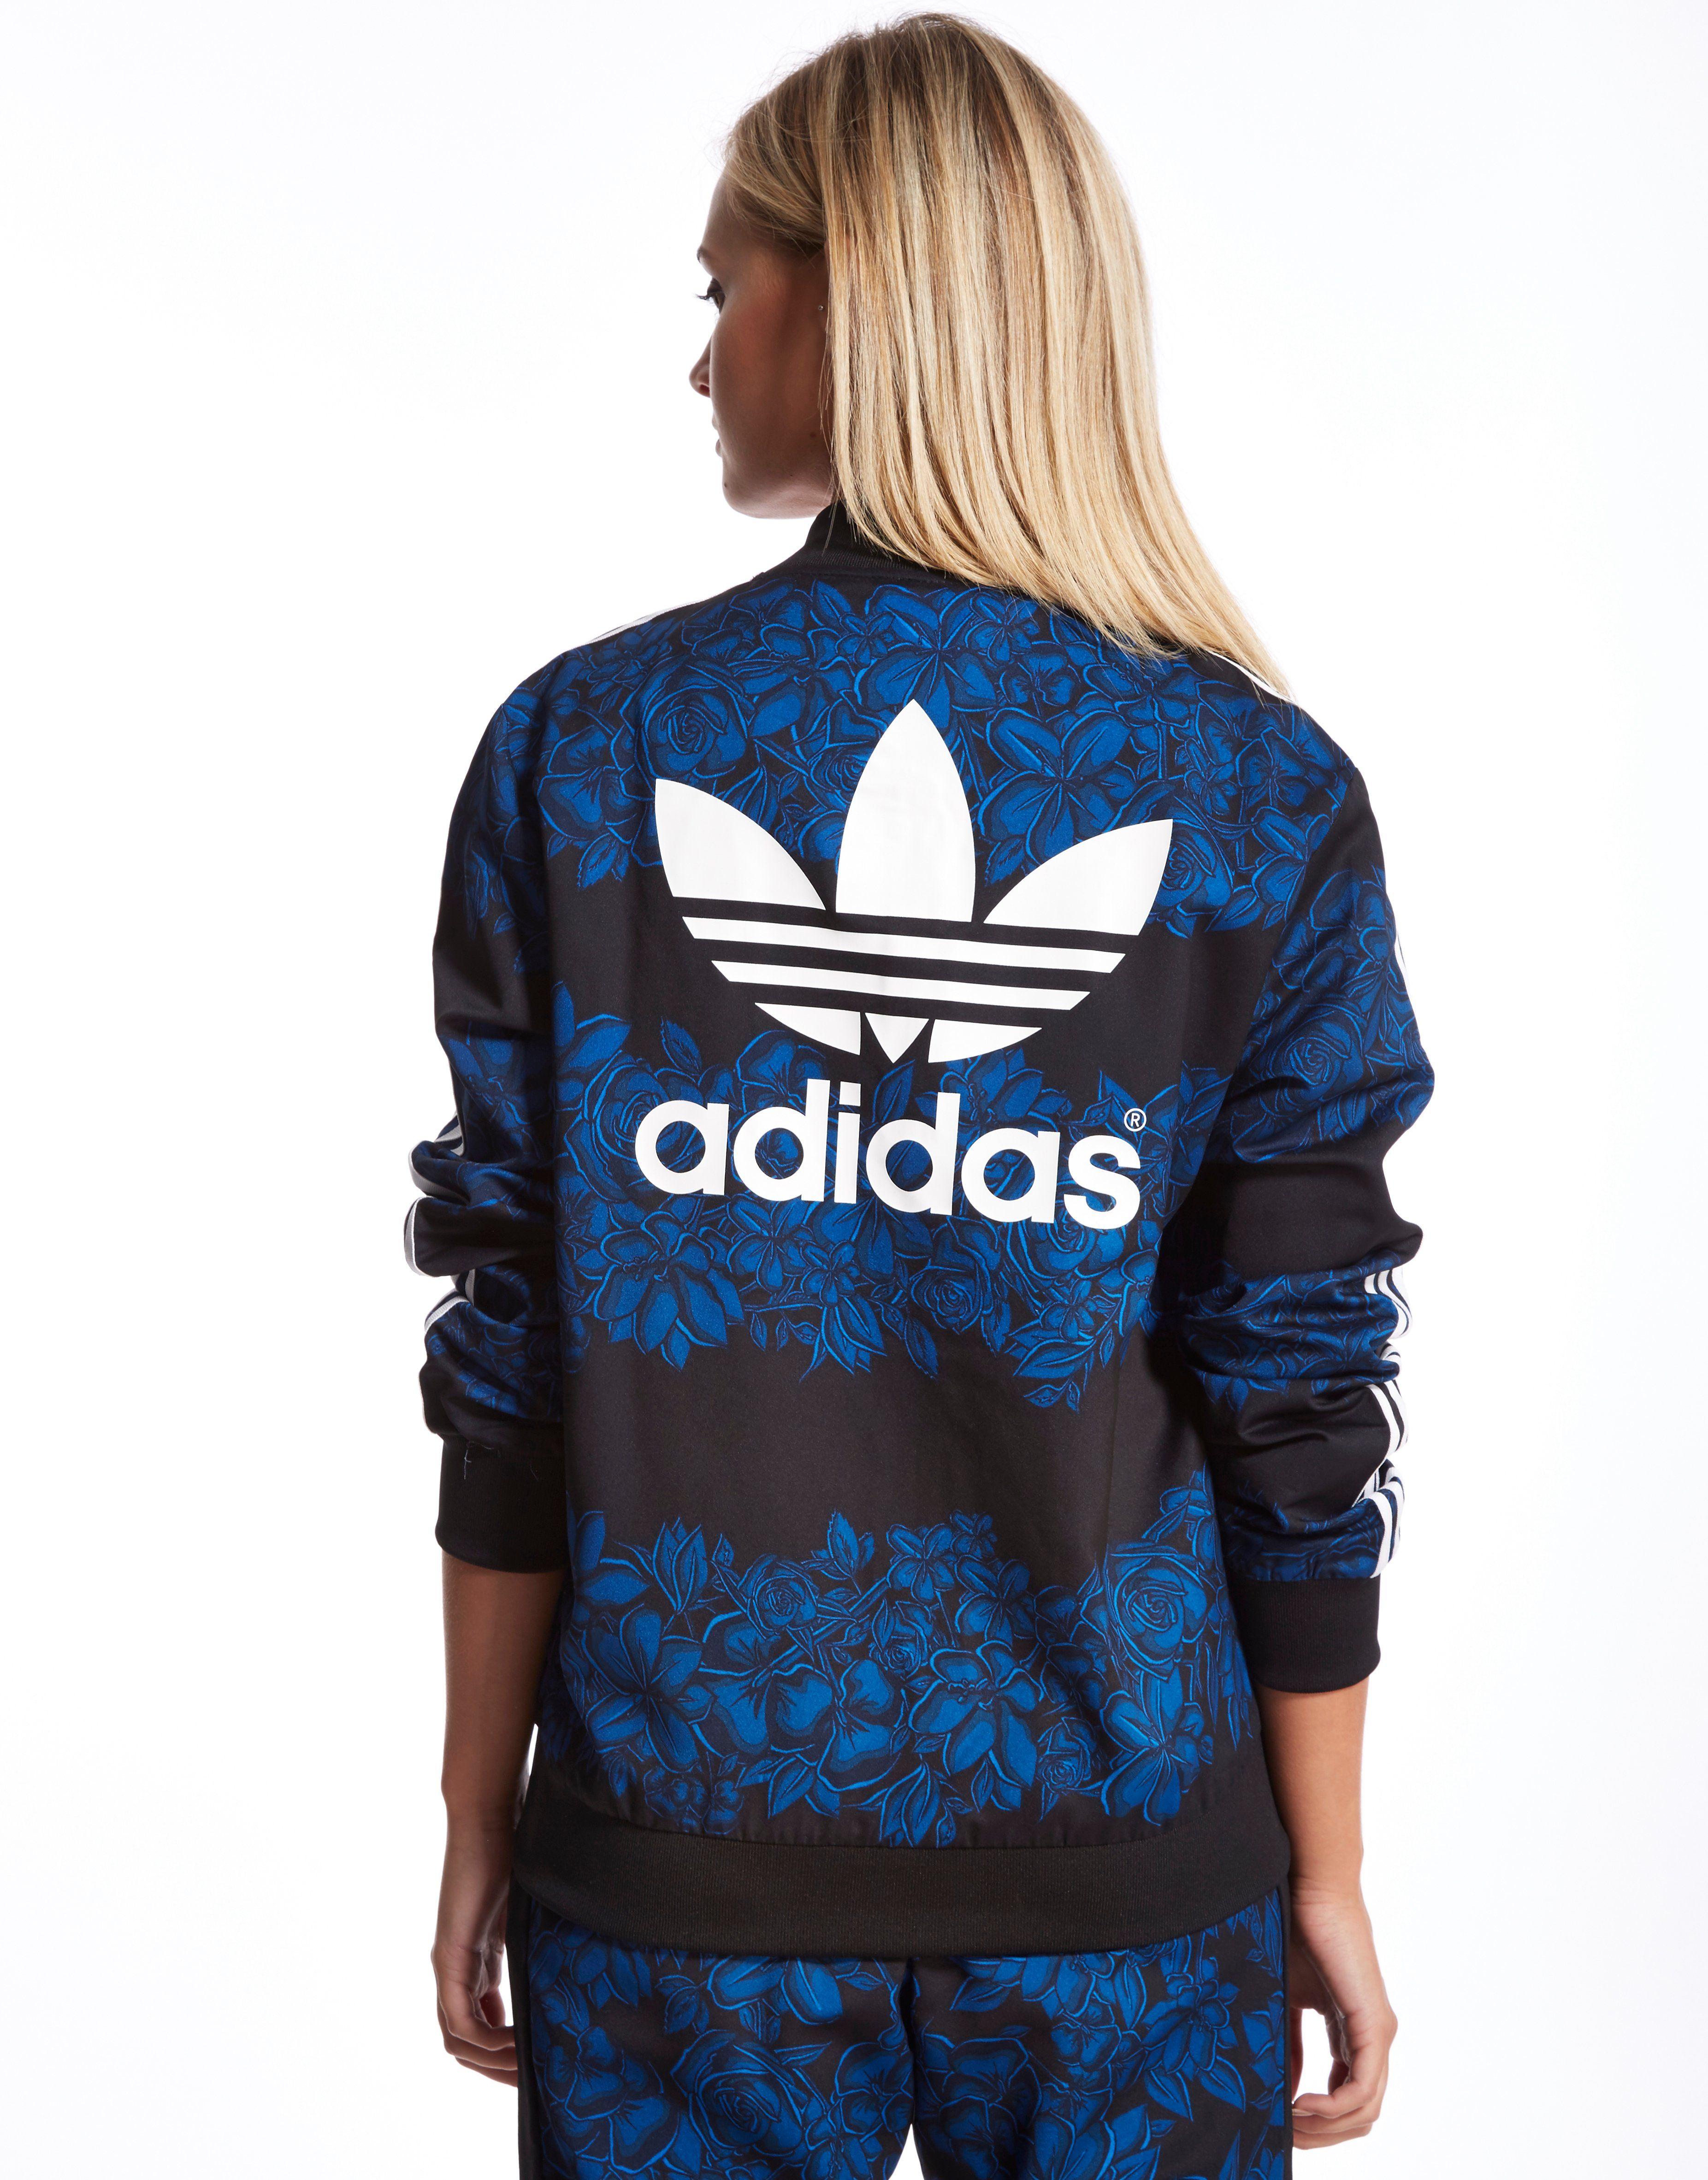 adidas originals blue floral track top